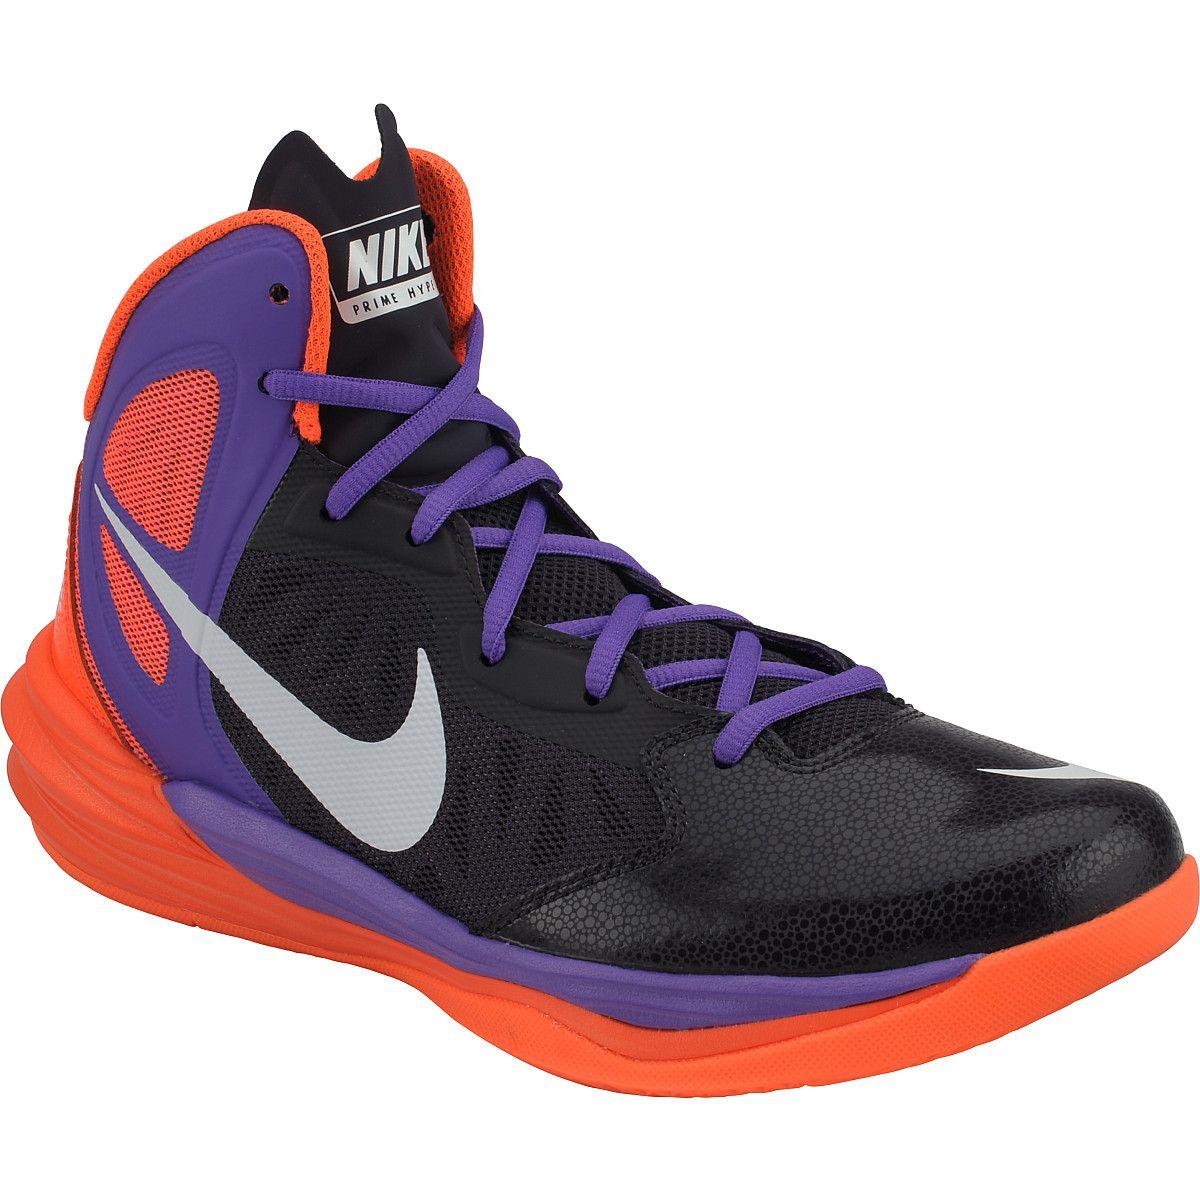 NIKE Men's Prime Hype DF Mid Basketball Shoes Nike men